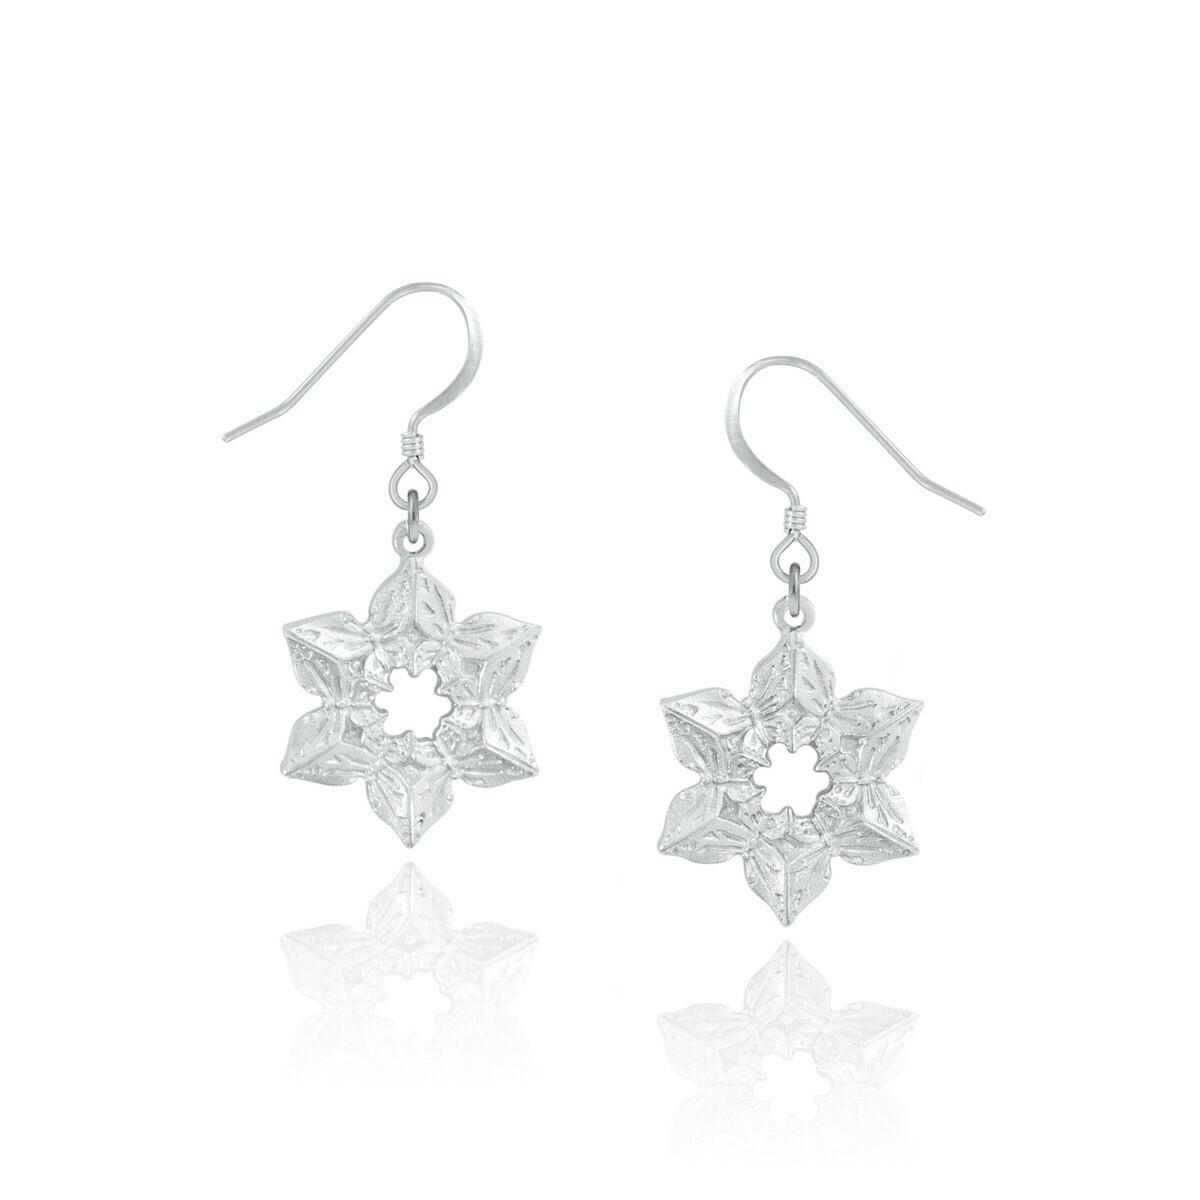 Winter Blossom Earrings - Amos